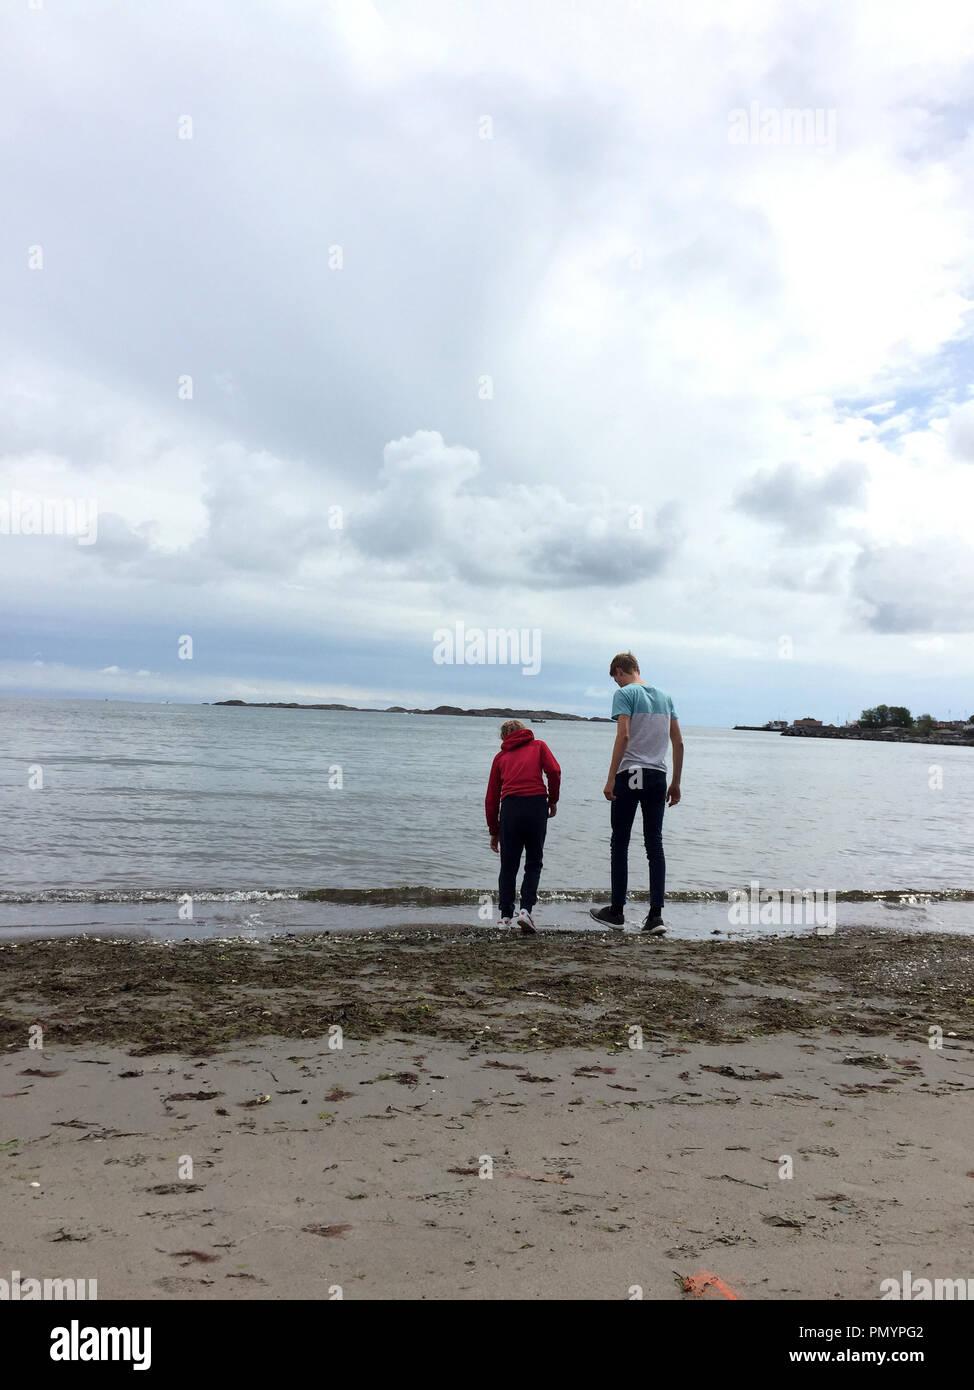 389ceadc40c1 a boy and a girl on a beach on a cloudy summer day